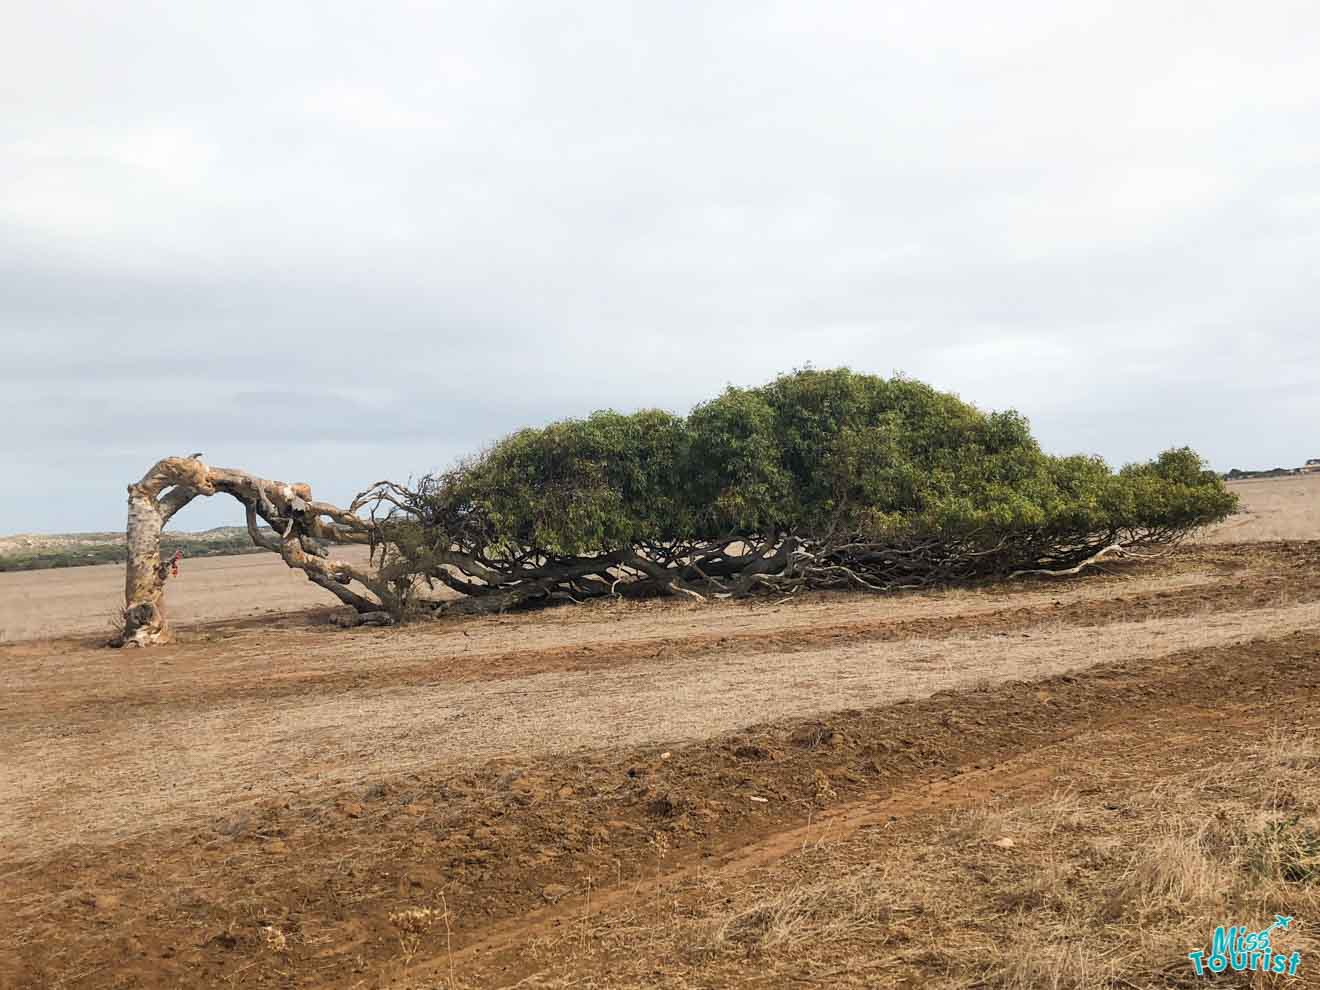 árbol australia perth en viaje por carretera exmouth